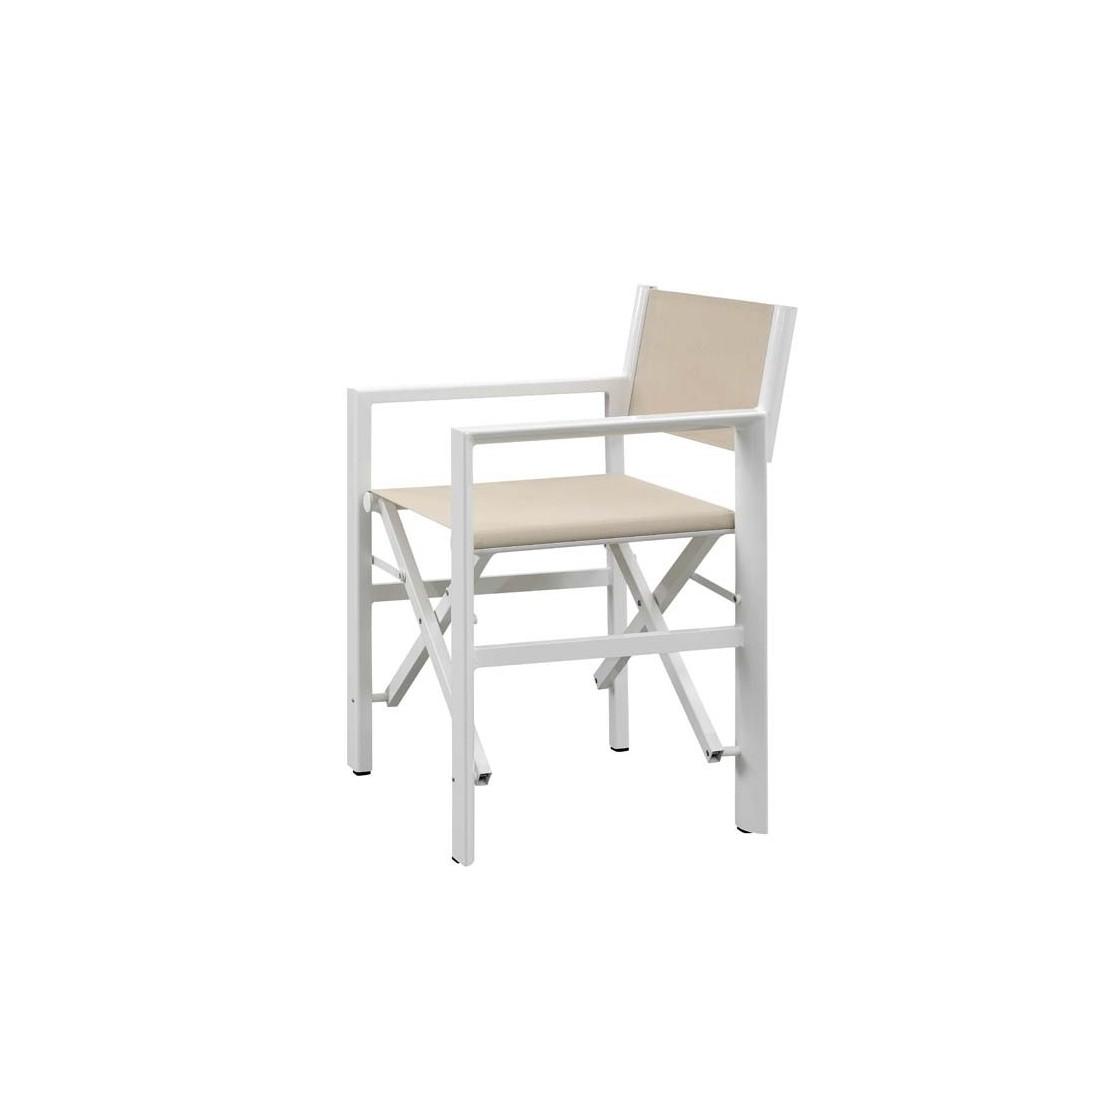 d co chaise fauteuil metteur en scene 33 colombes colombes quel rer rer colombes stade. Black Bedroom Furniture Sets. Home Design Ideas